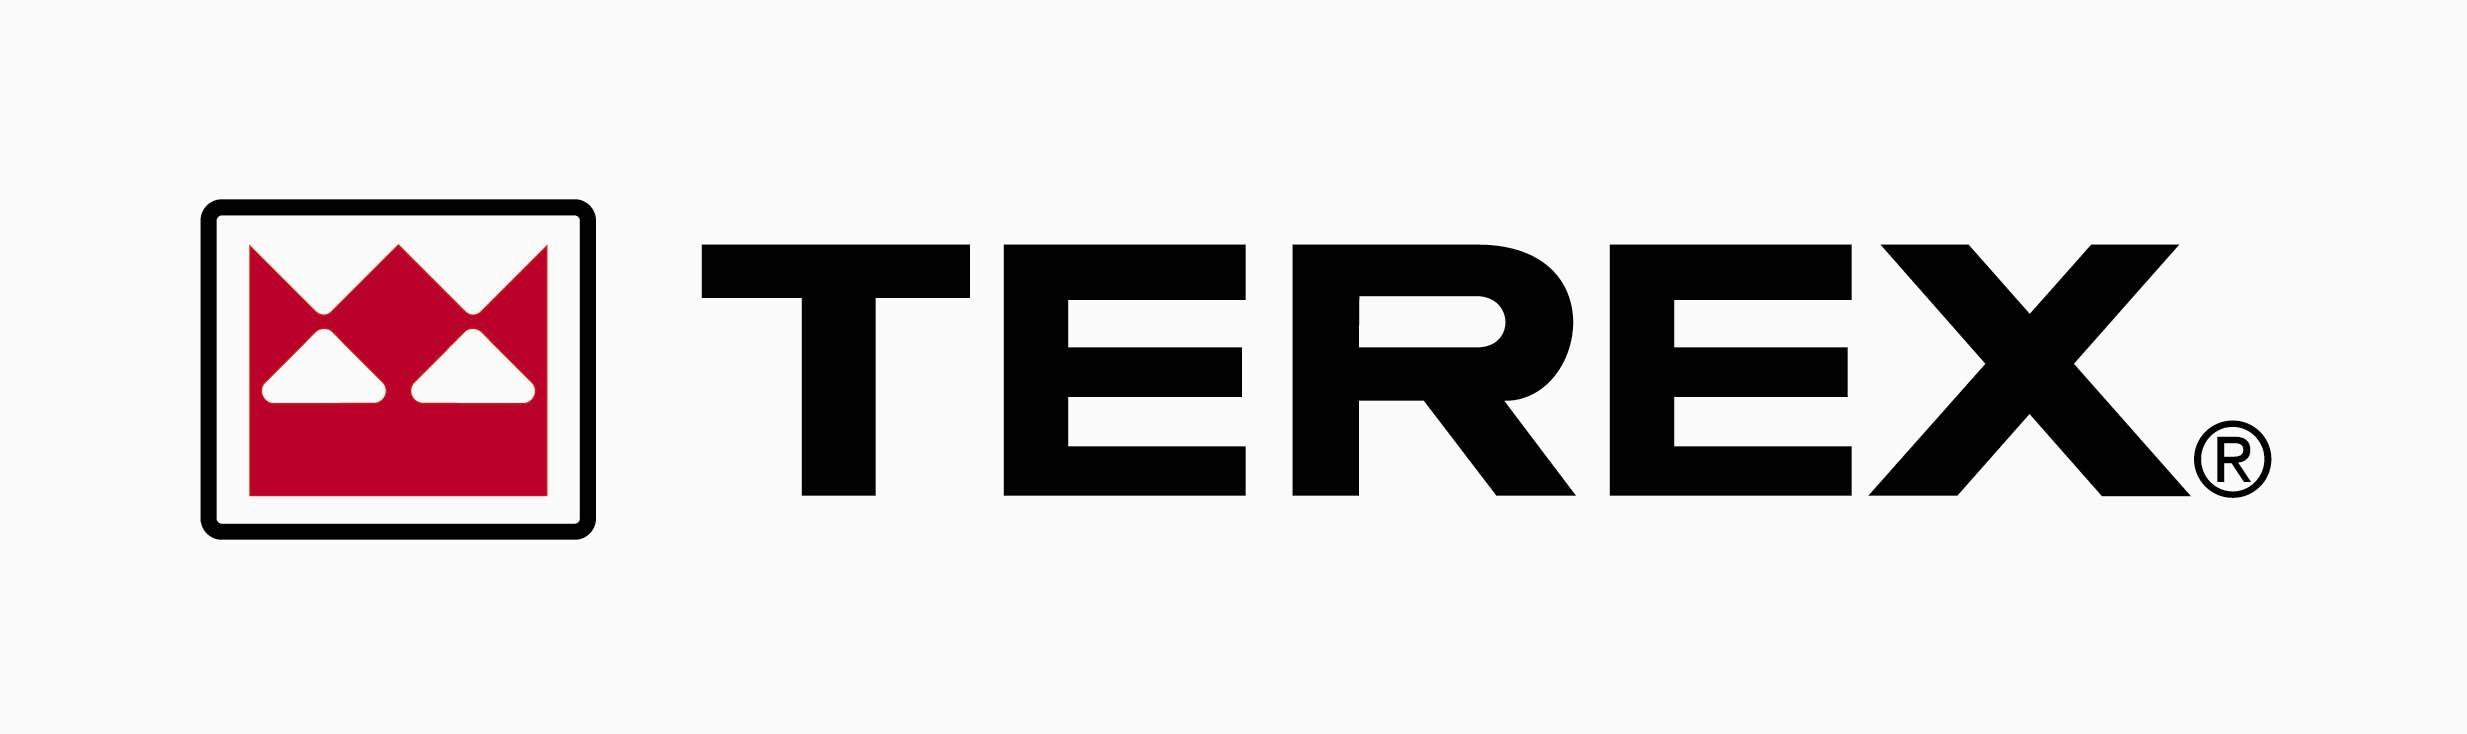 Terex appoints new cfo among senior leadership changes - Terex material handling port solutions ag ...